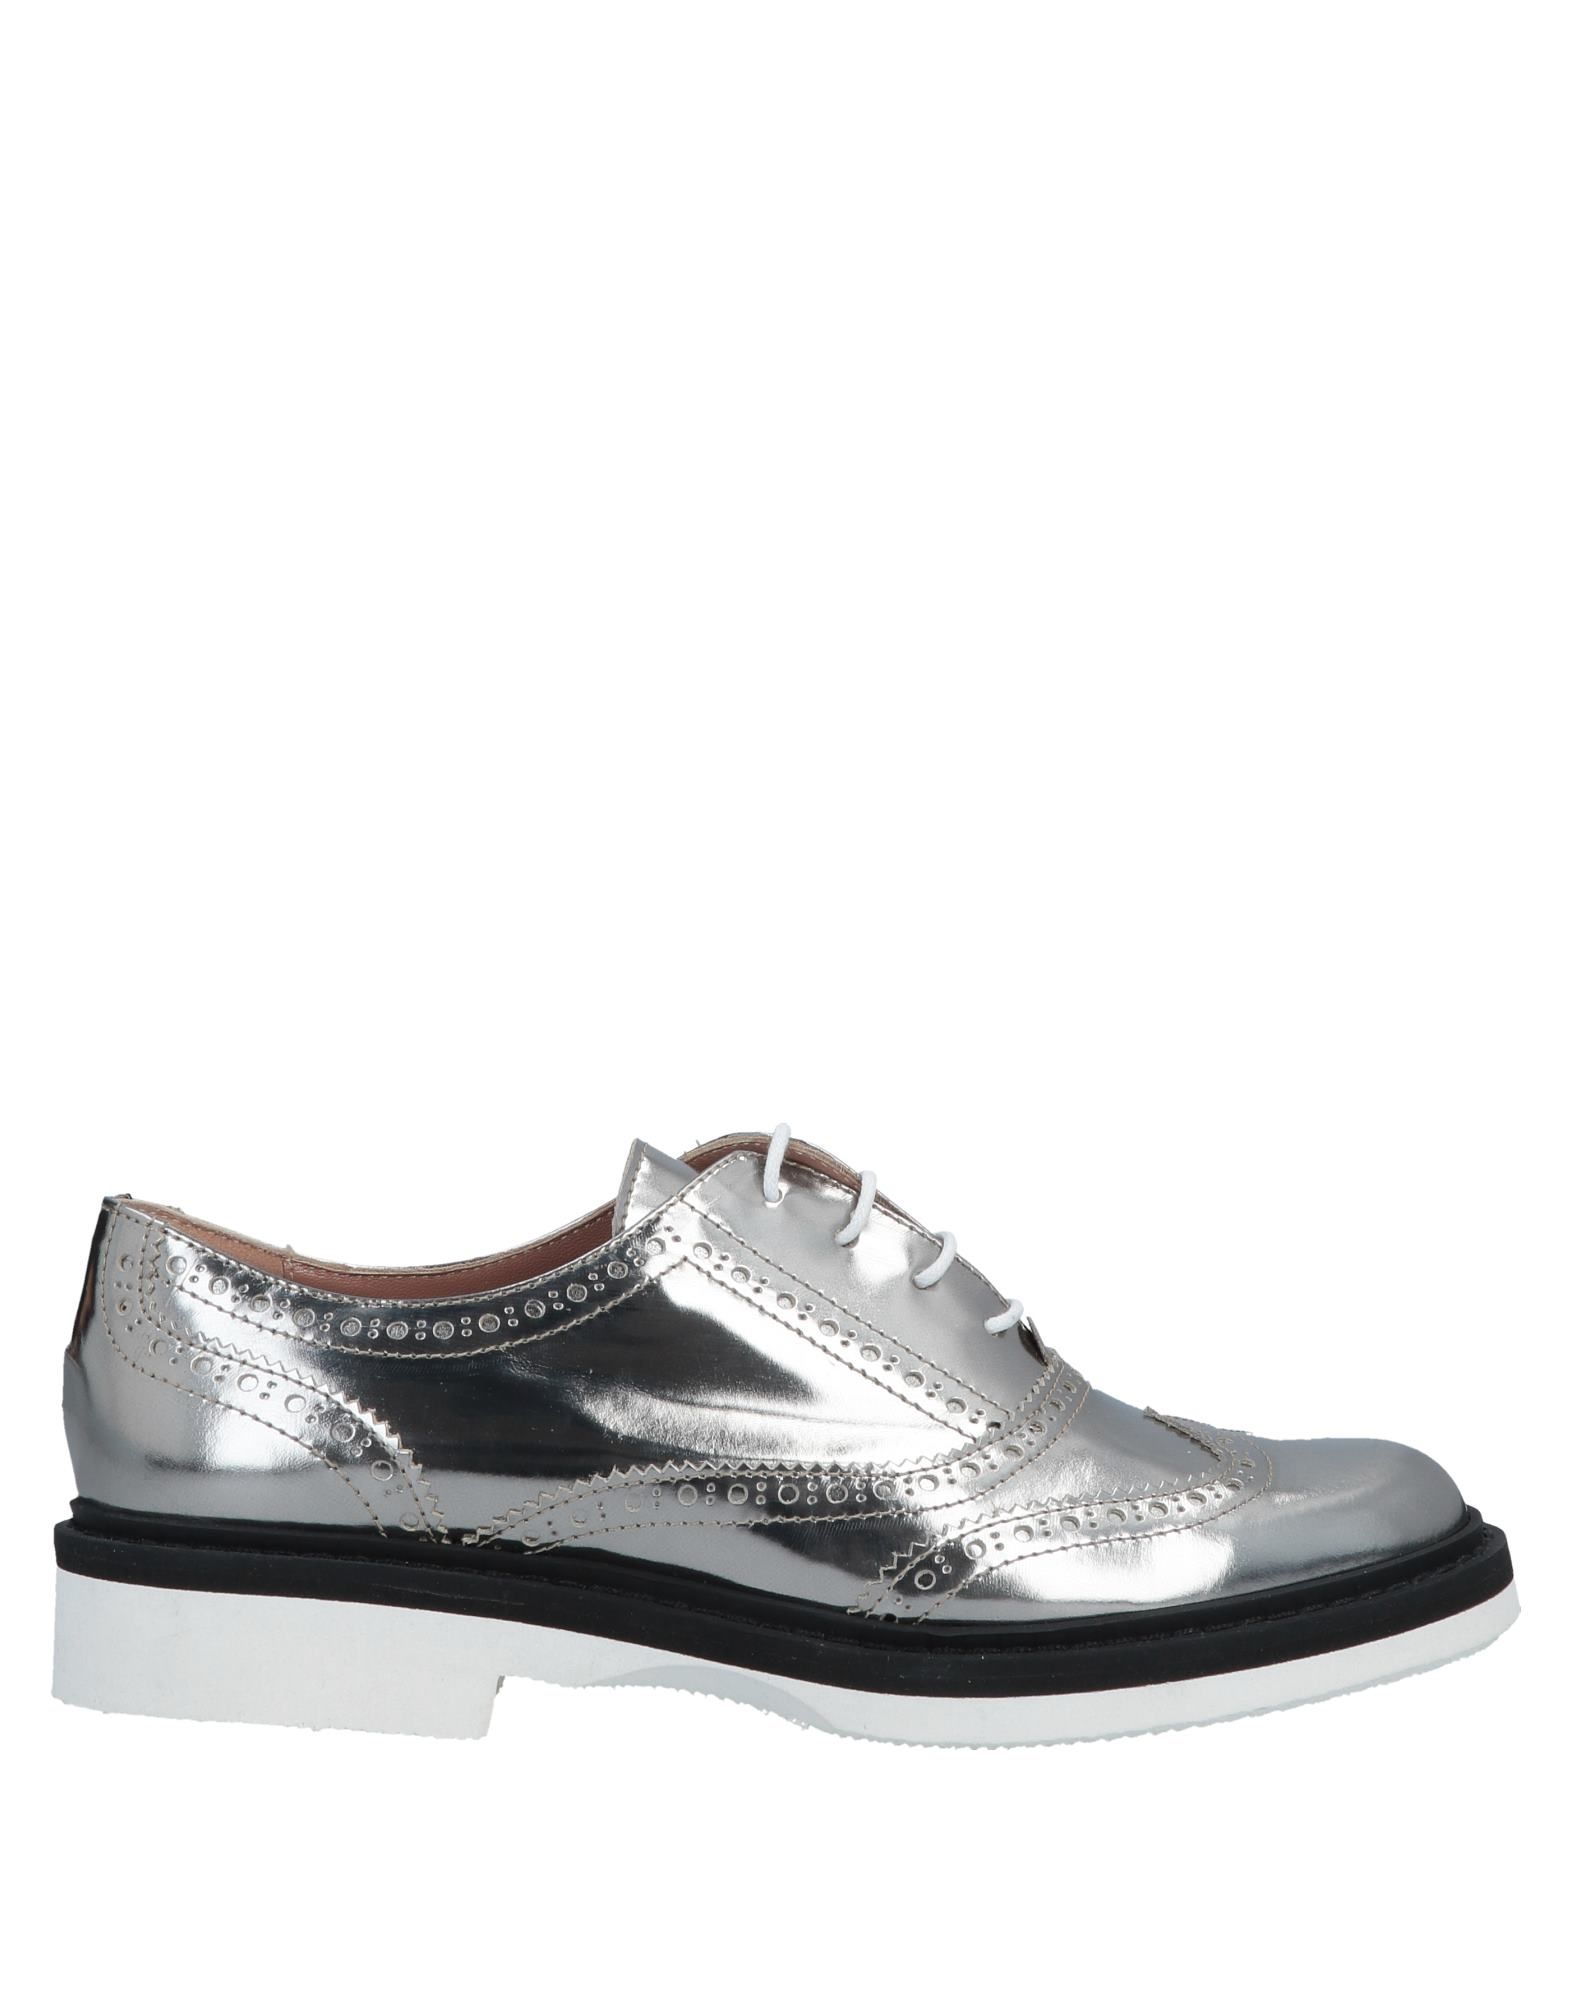 Фото - ALIYAH Обувь на шнурках обувь на высокой платформе dkny